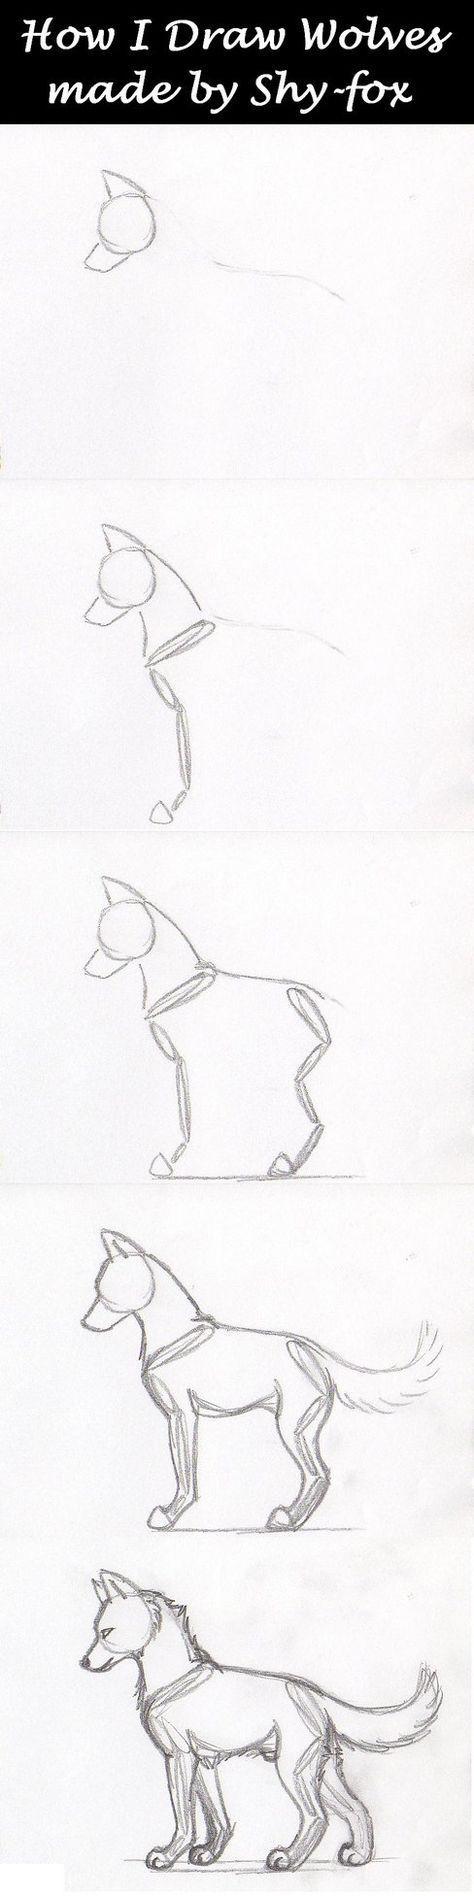 Photo of drawing wolf anatomy by shy-fox on DeviantArt